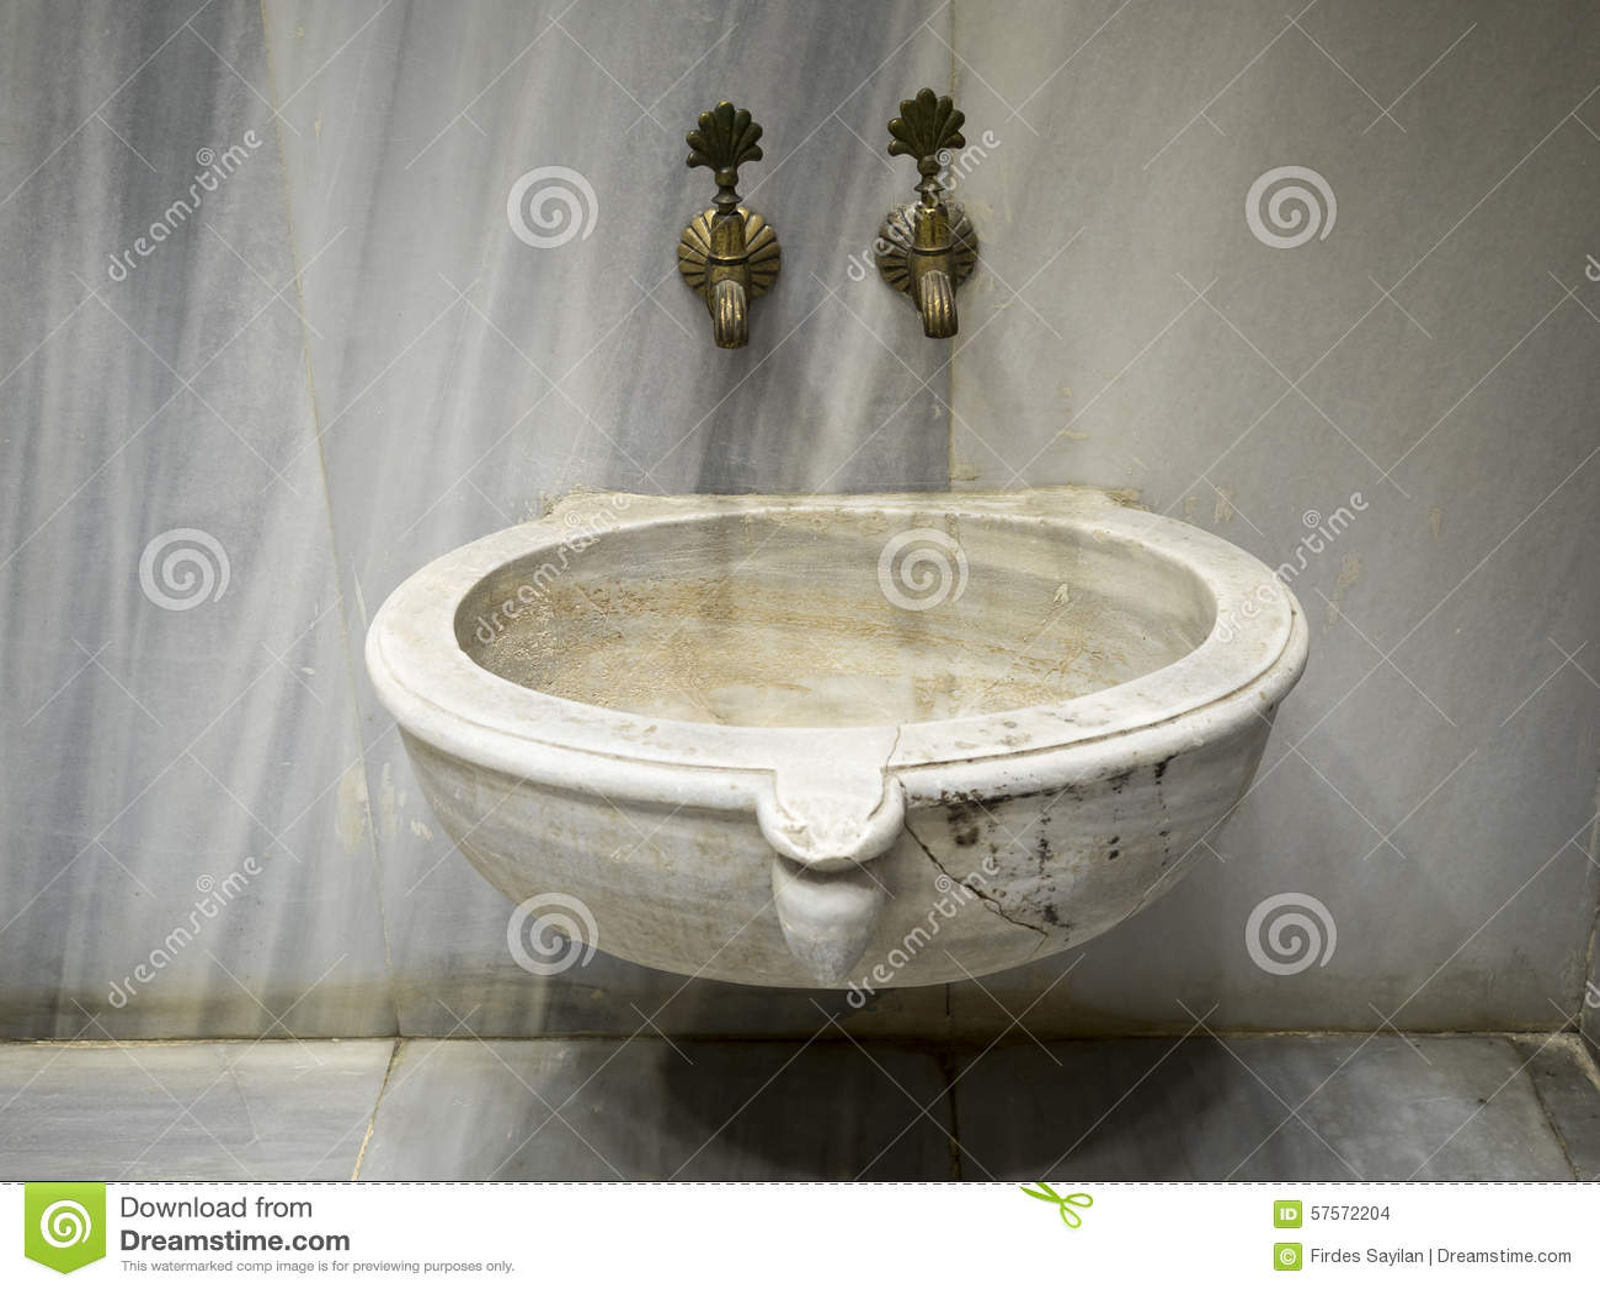 salle de bain hammam good ambre with salle de bain hammam perfect beau modele douche salle de. Black Bedroom Furniture Sets. Home Design Ideas